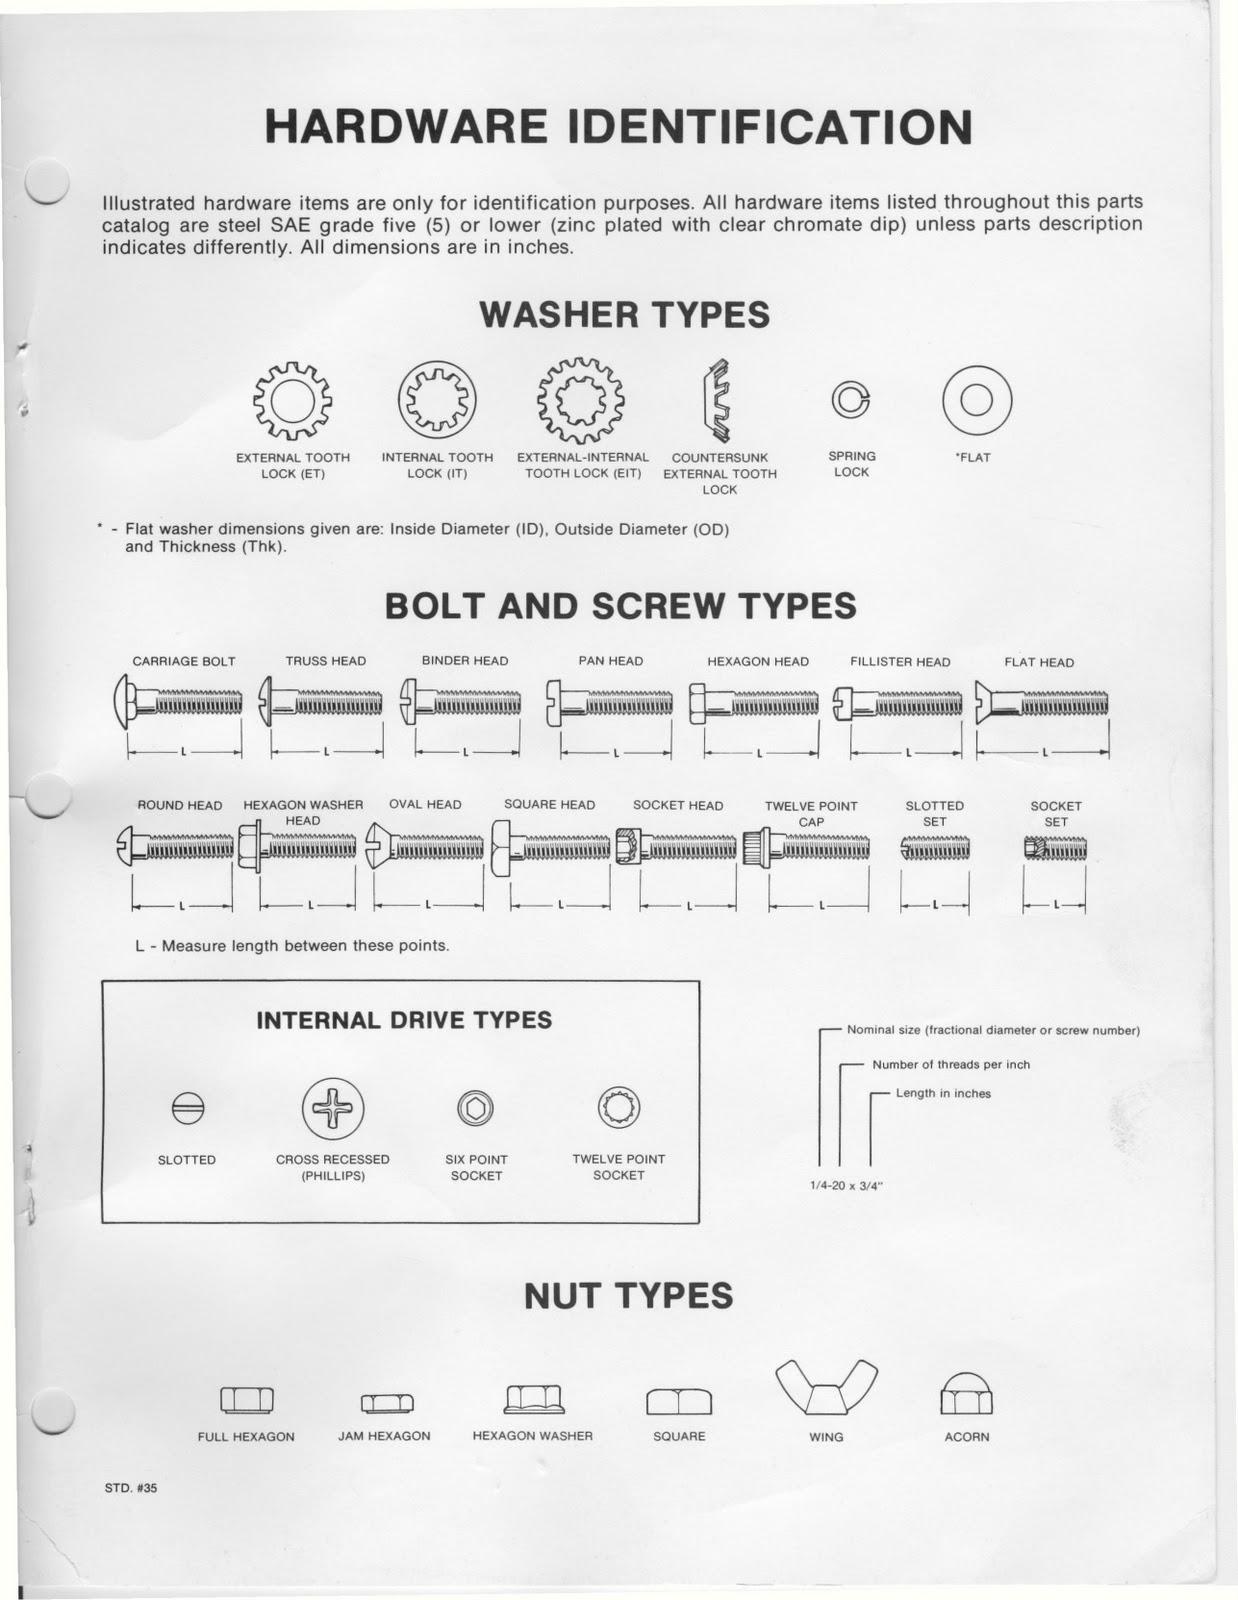 6000 onan rv generator wiring diagram onan 6000 watt generator wiring  diagram generator onan wiring circuit